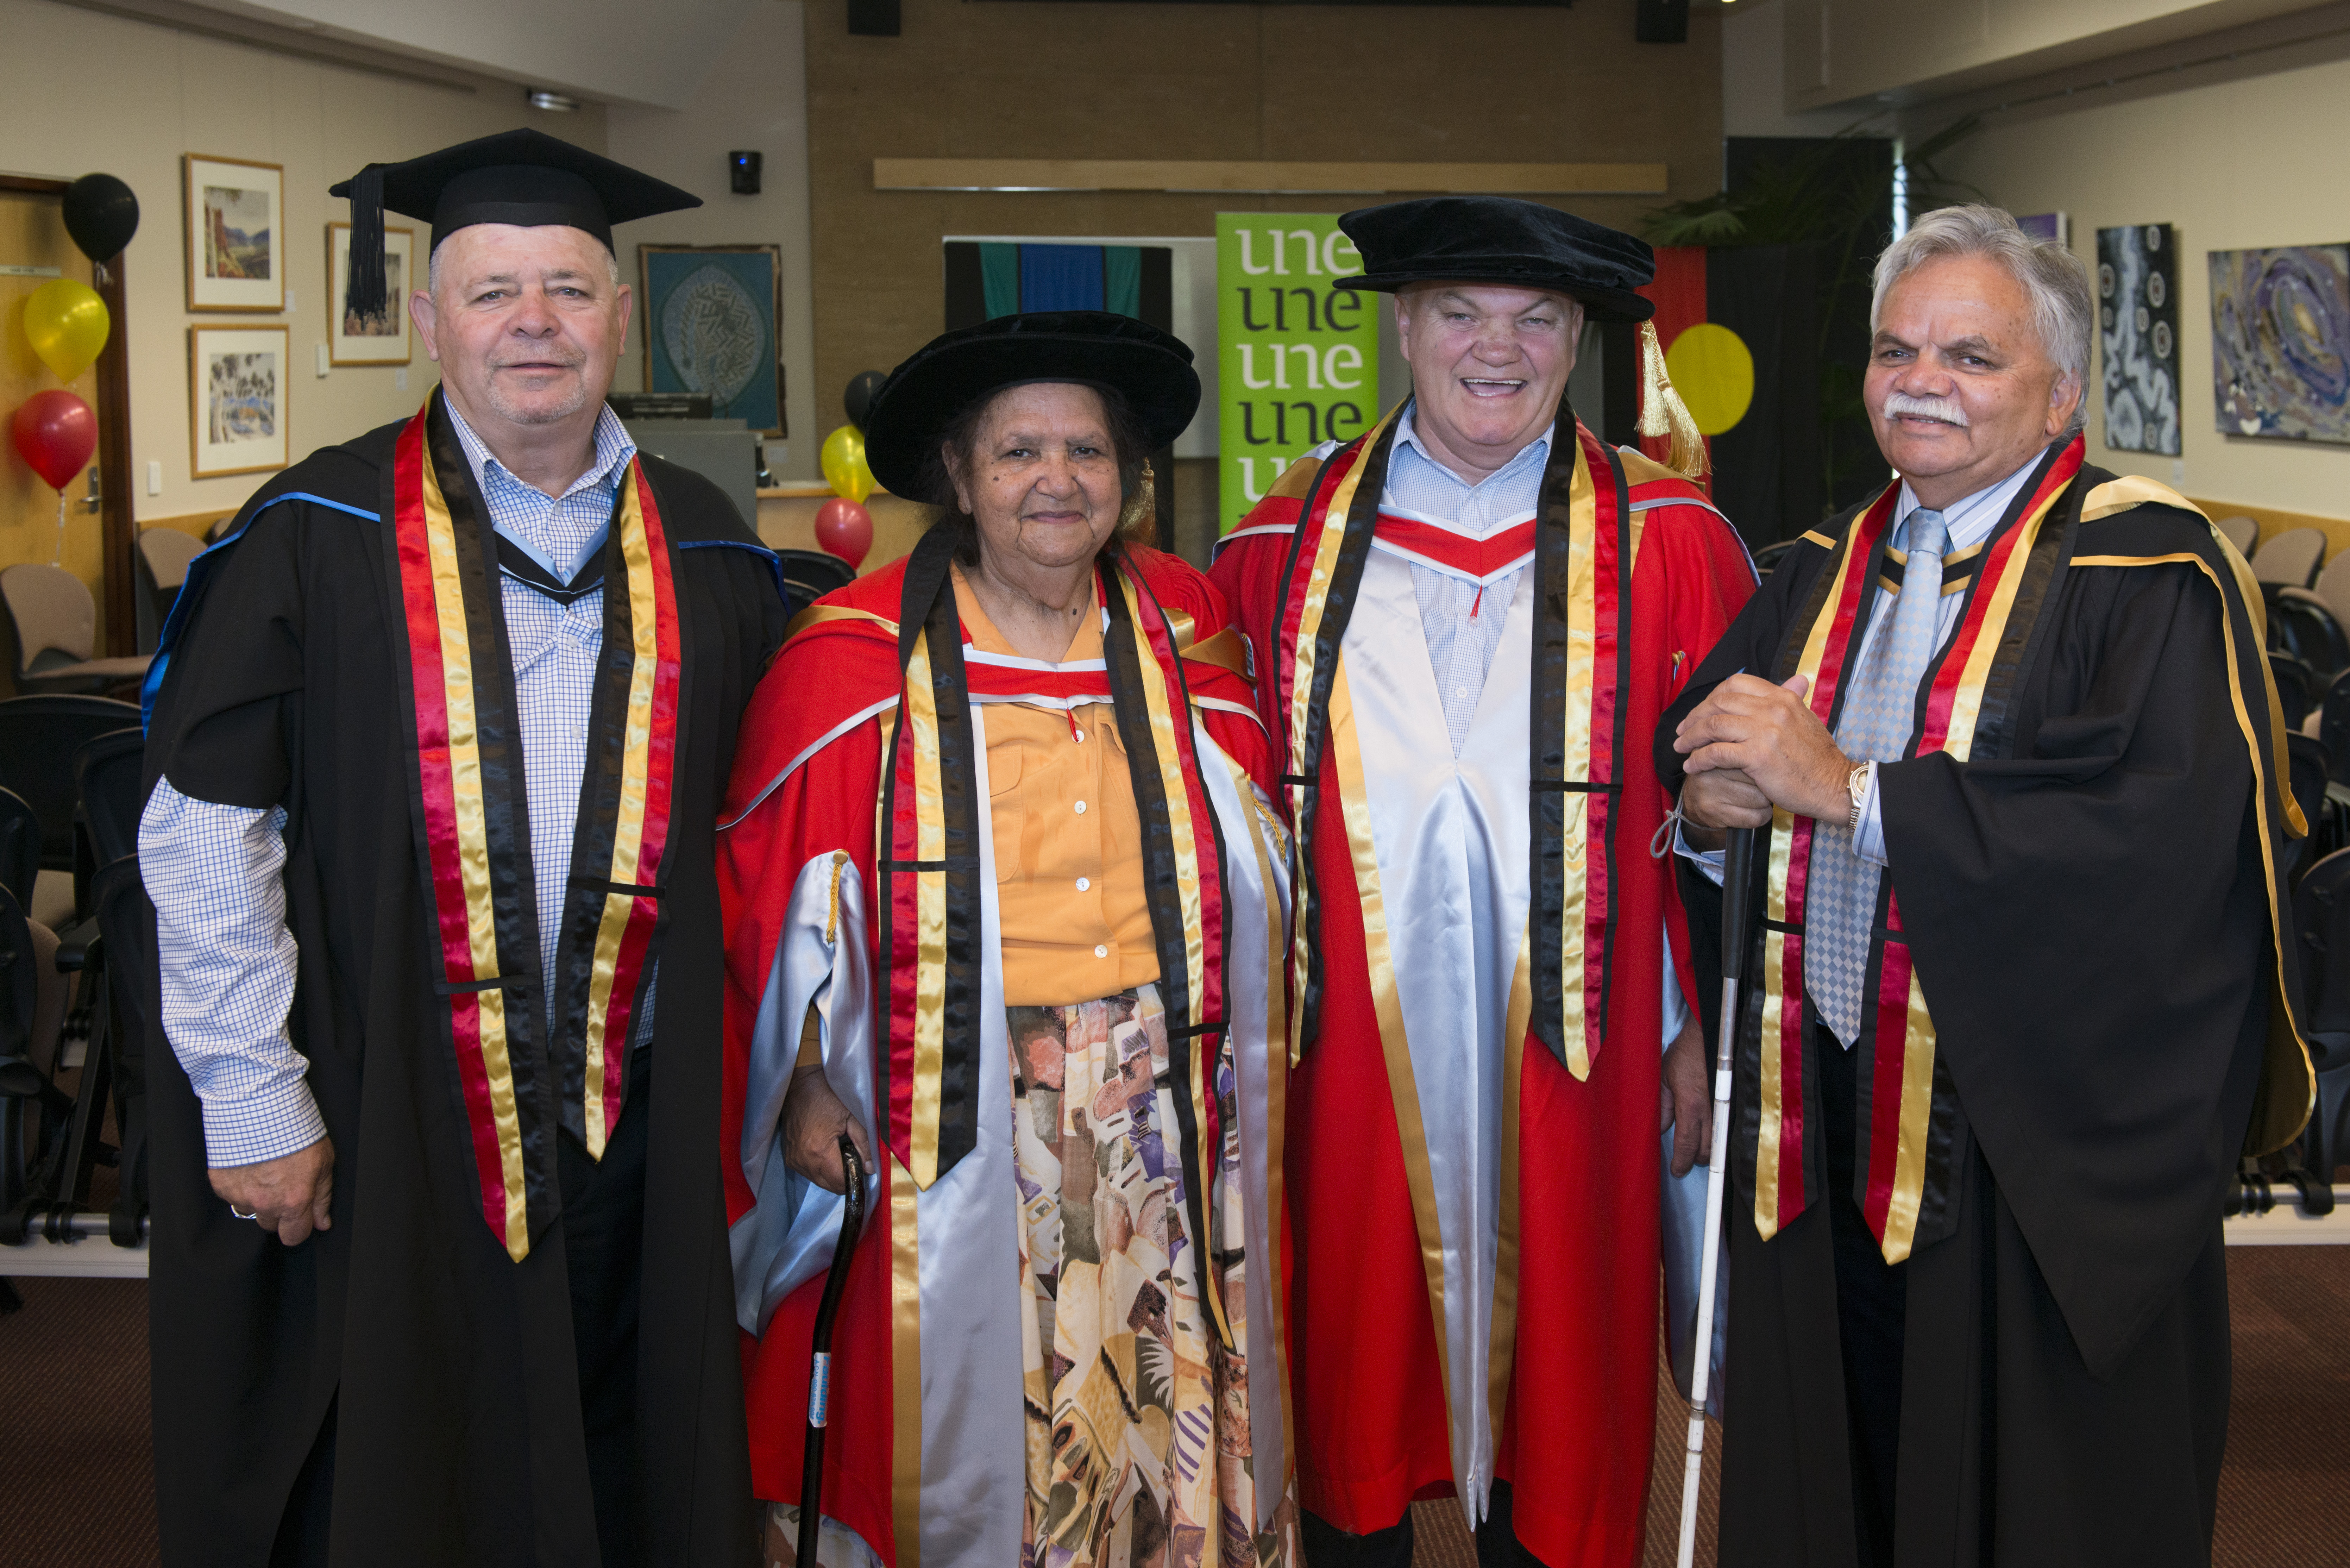 Oorala representatives in academic robes